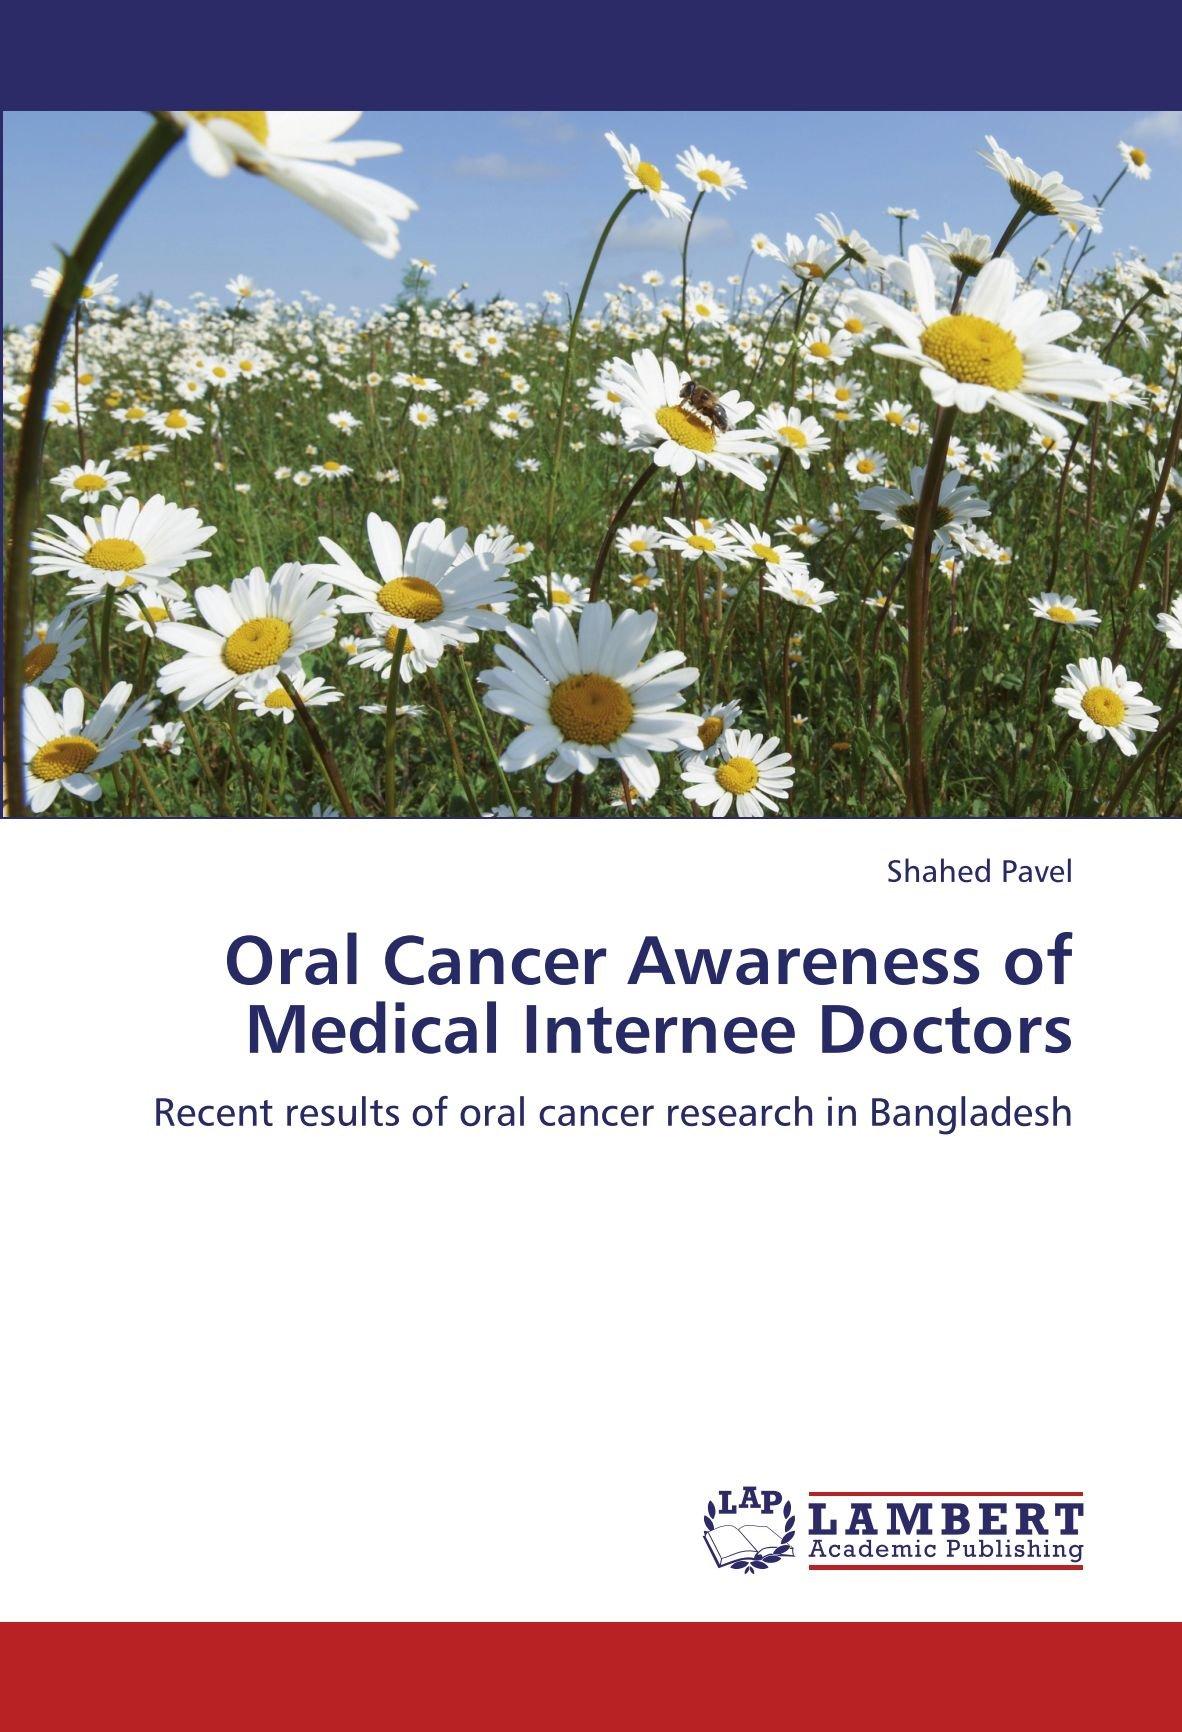 Oral Cancer Awareness of Medical Internee Doctors: Recent results of